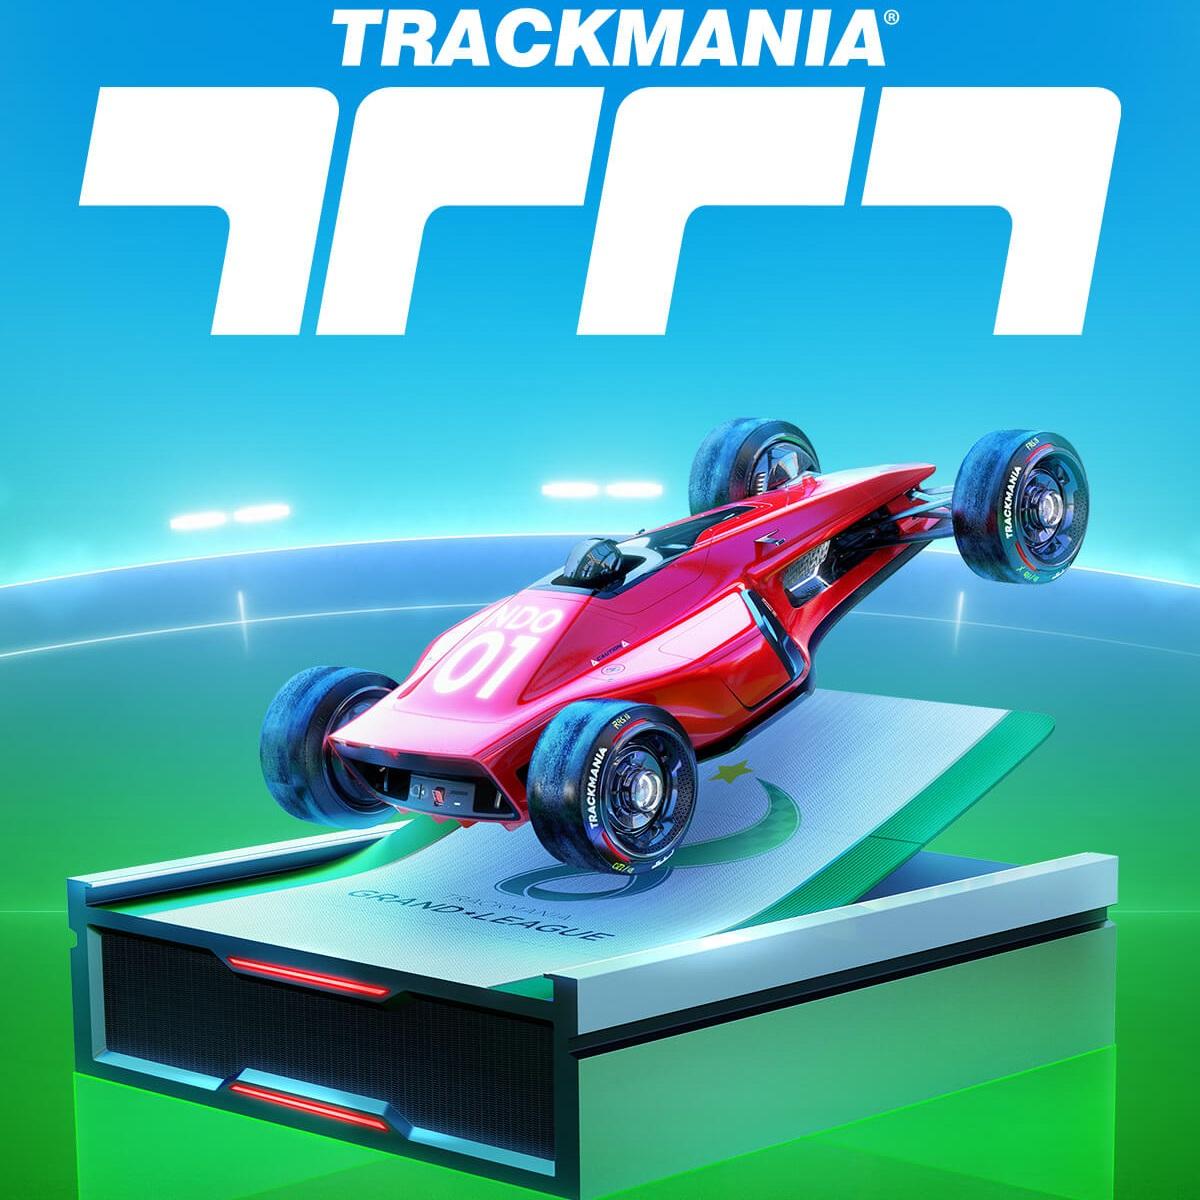 3 Monate Trackmania (2020) Club Access kostenlos für Prime Gaming/Amazon Prime Abonnenten